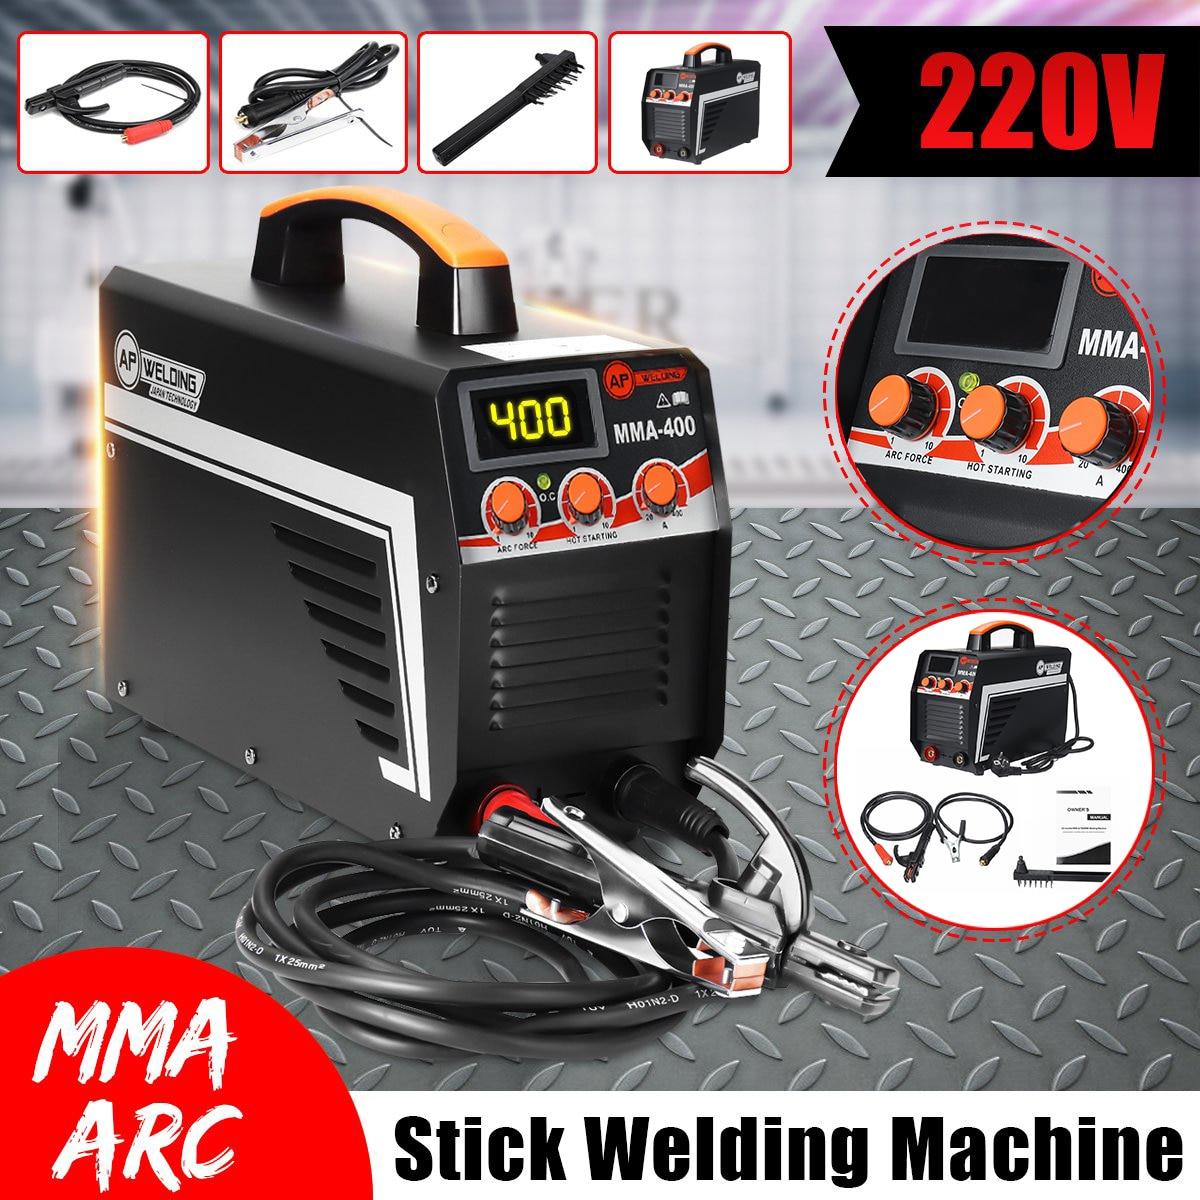 New IGBT Inverter Arc Electric Welding Machine MMA-400 220V Digital Display Arc Stick Welders Set For DIY Home Welding Working